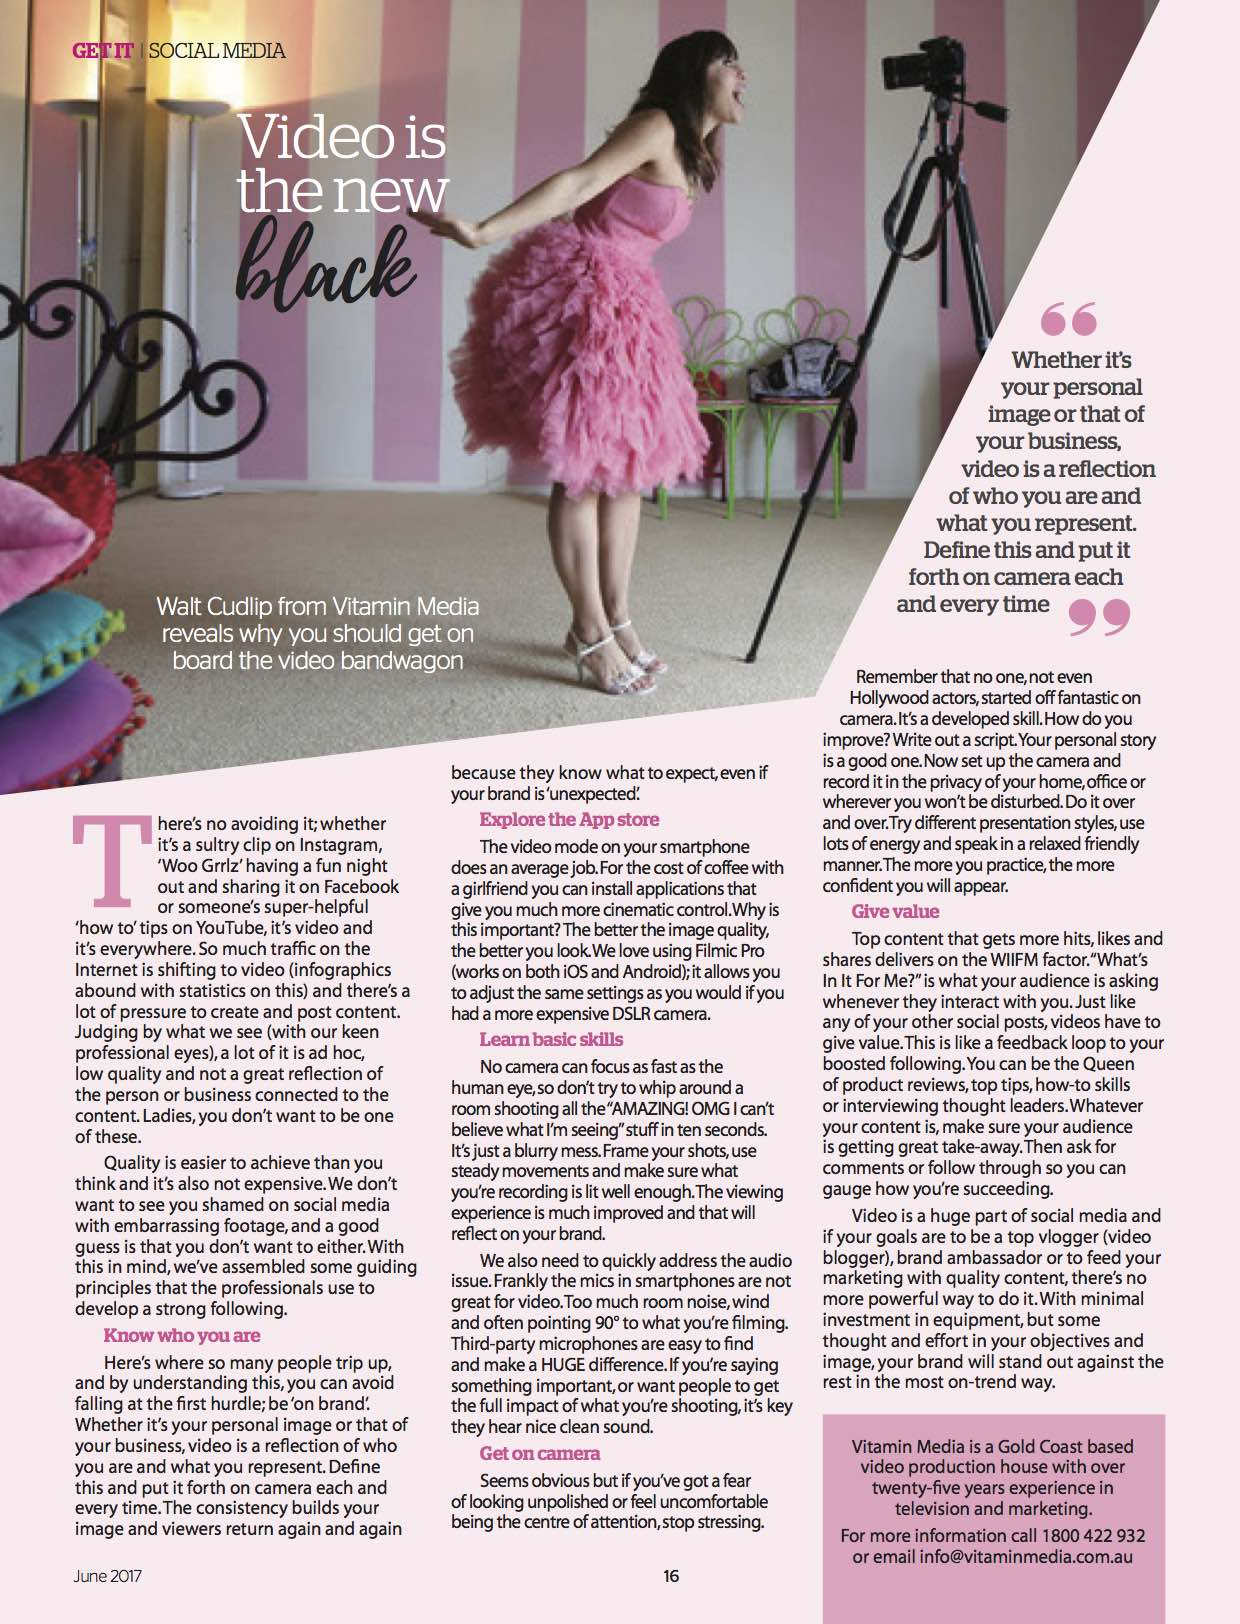 GetIt Magazine feature article image